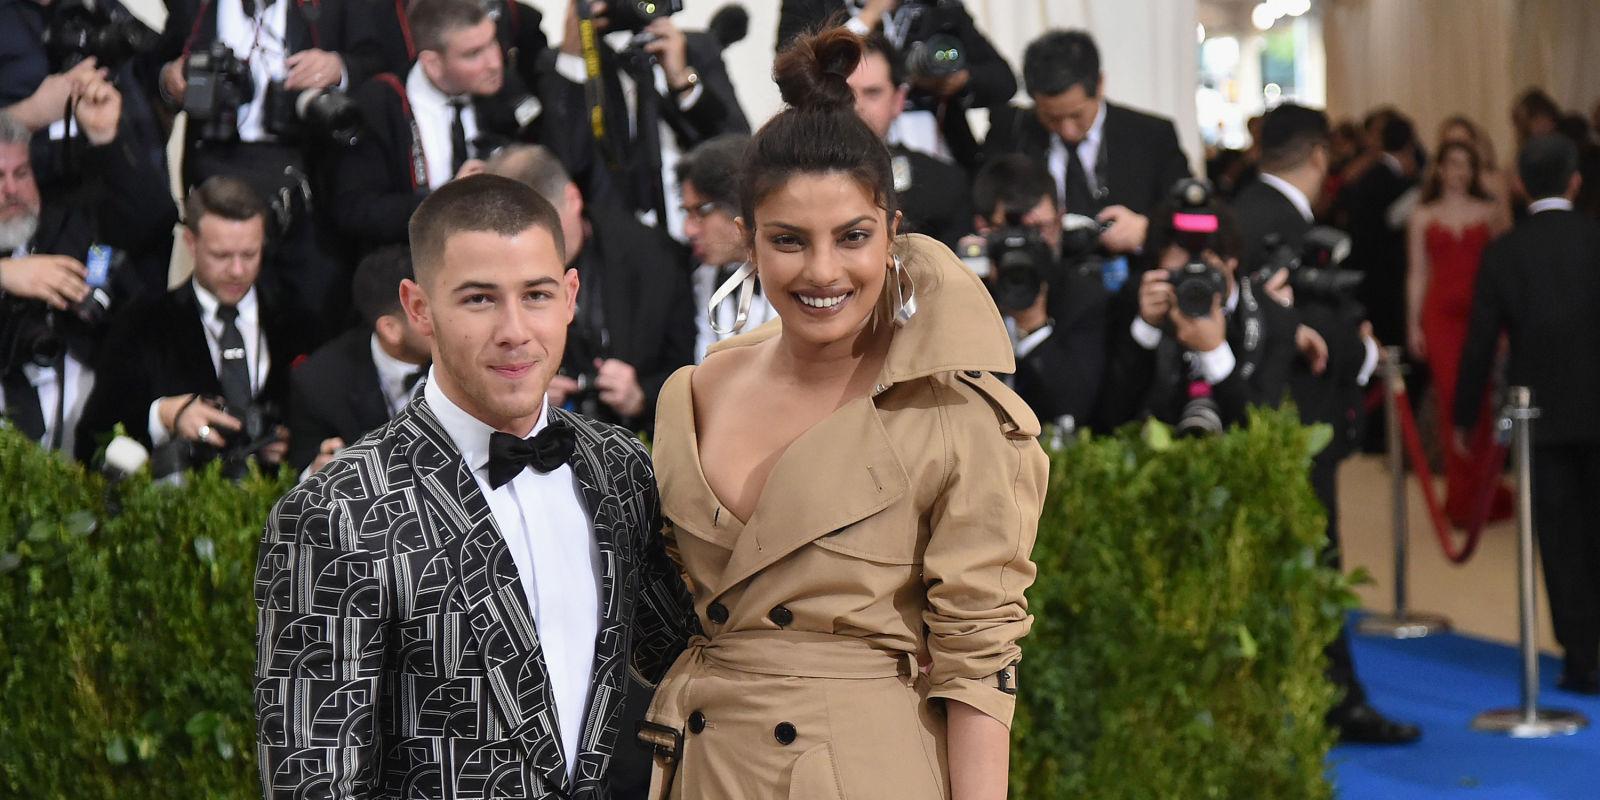 Priyanka Chopra on How She Ended Up With '11-Year-Old' Nick Jonas as Her Met Gala Date